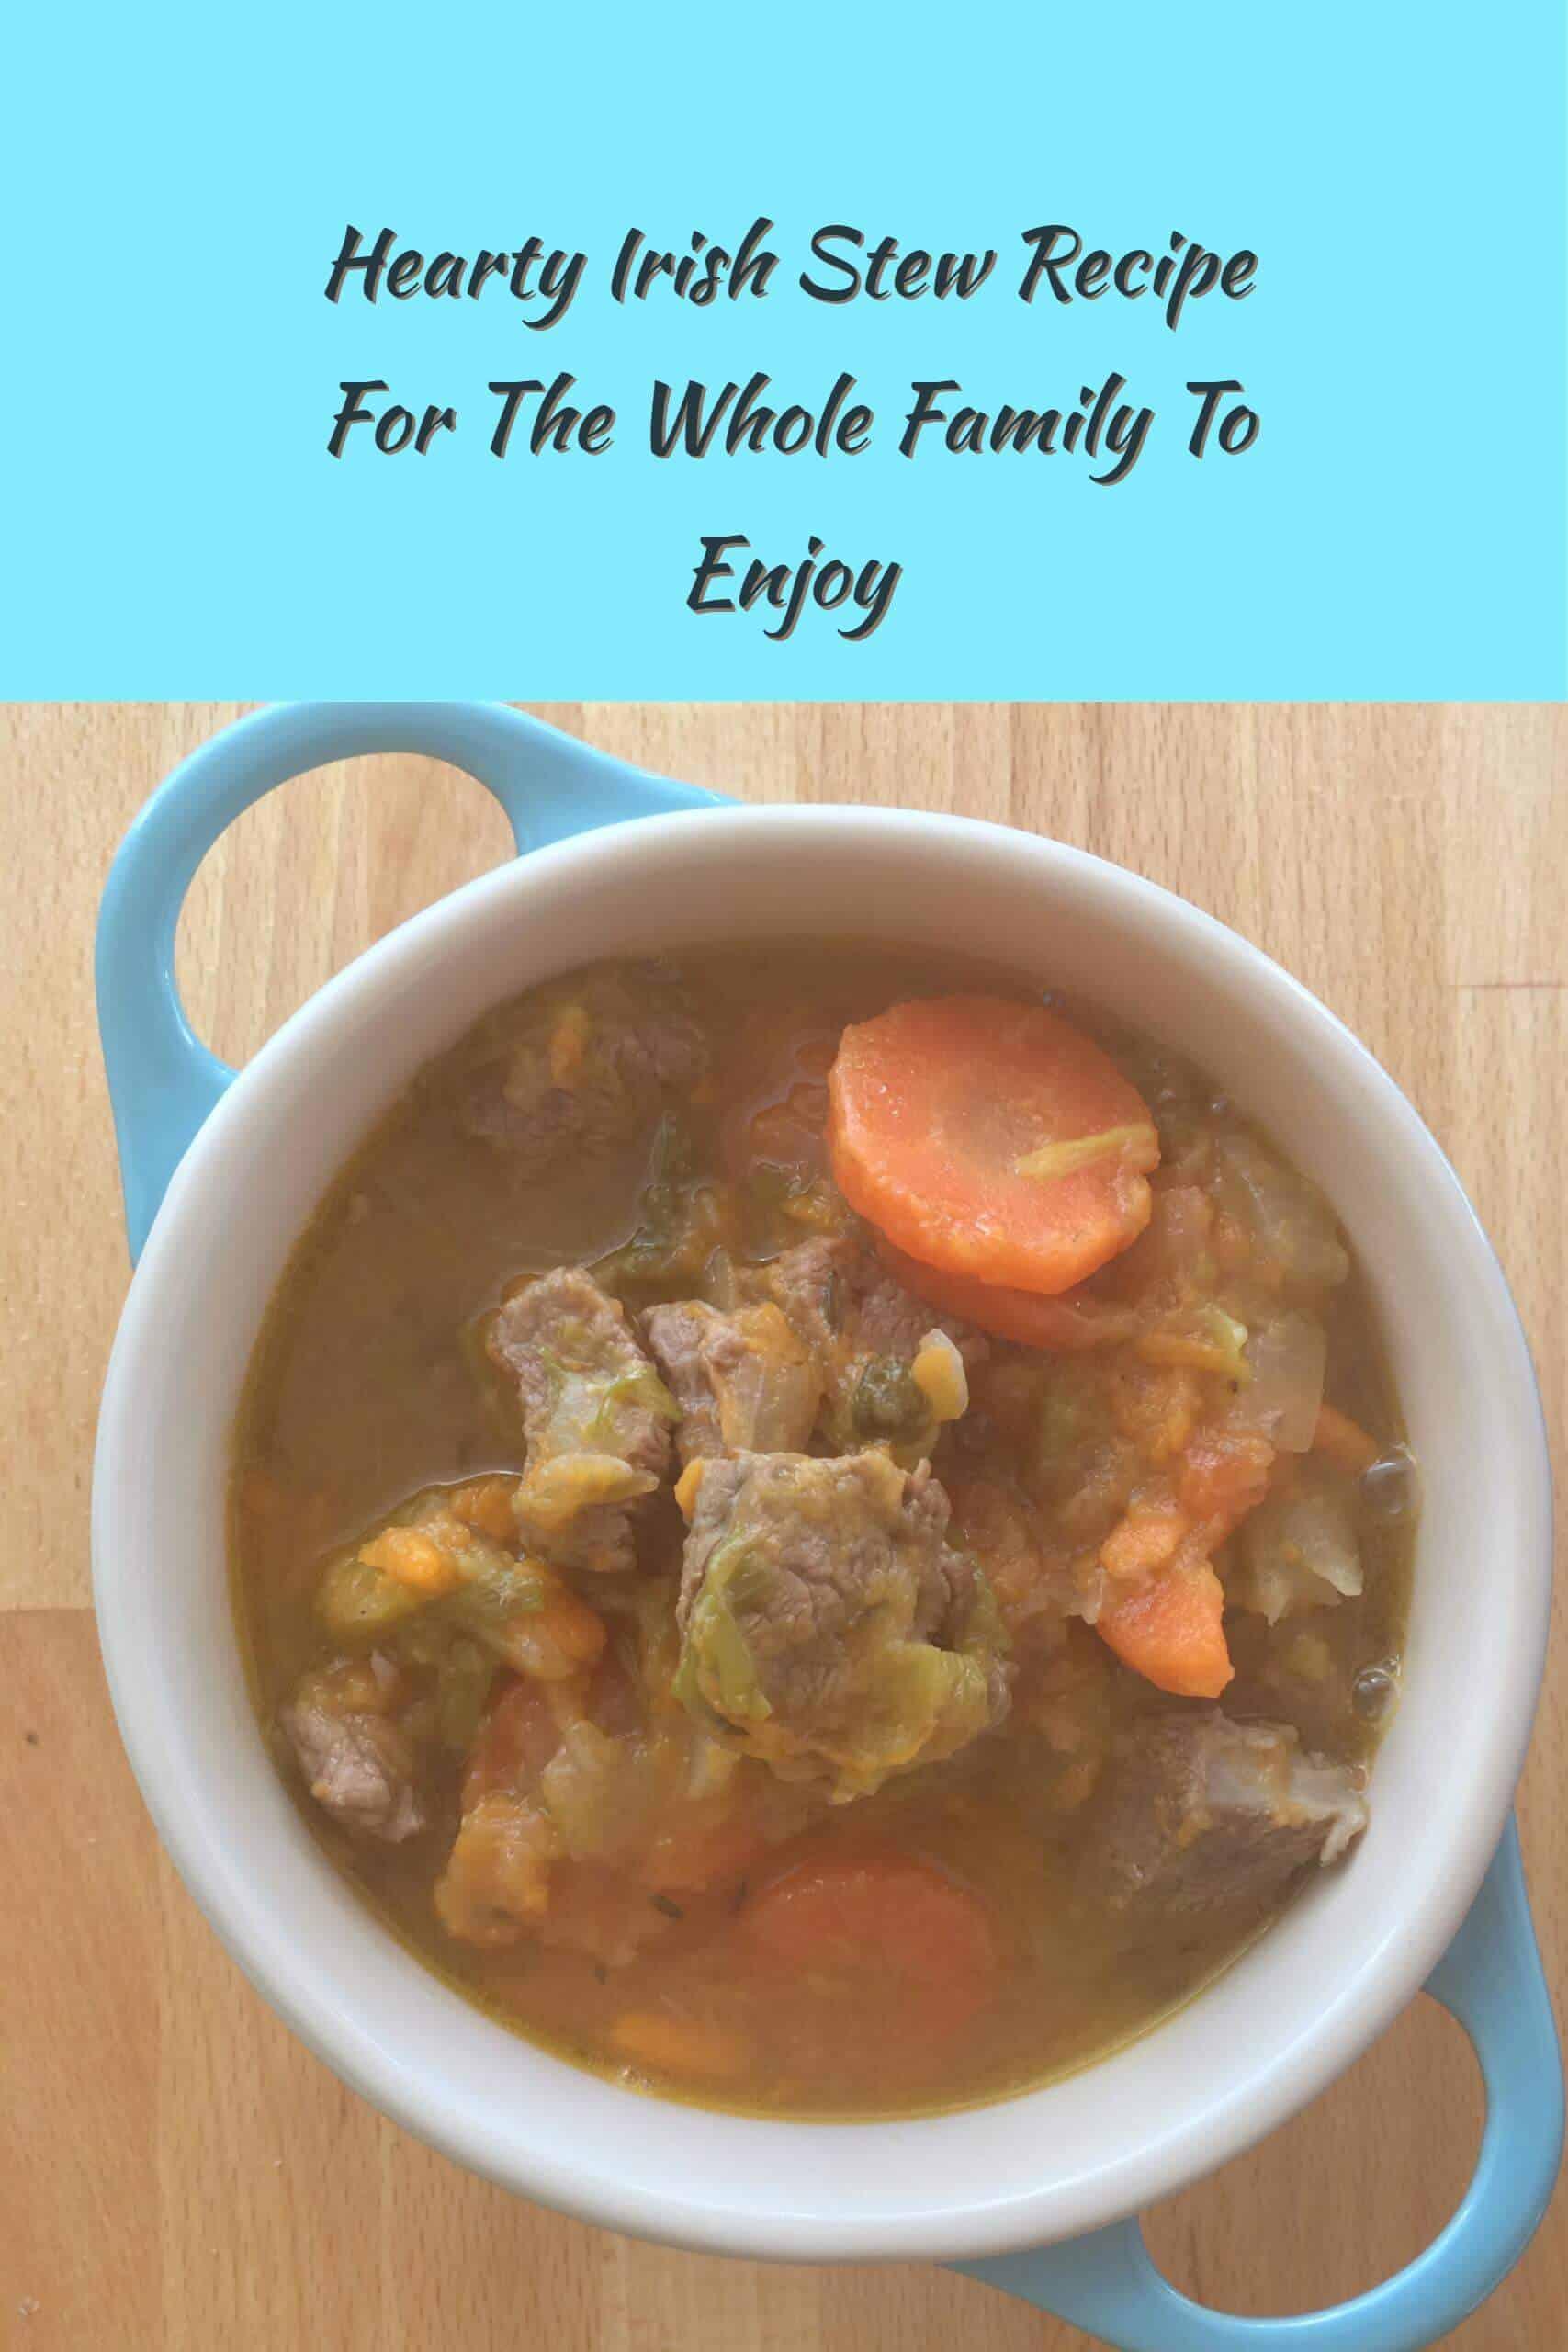 Hearty Irish Stew Recipe